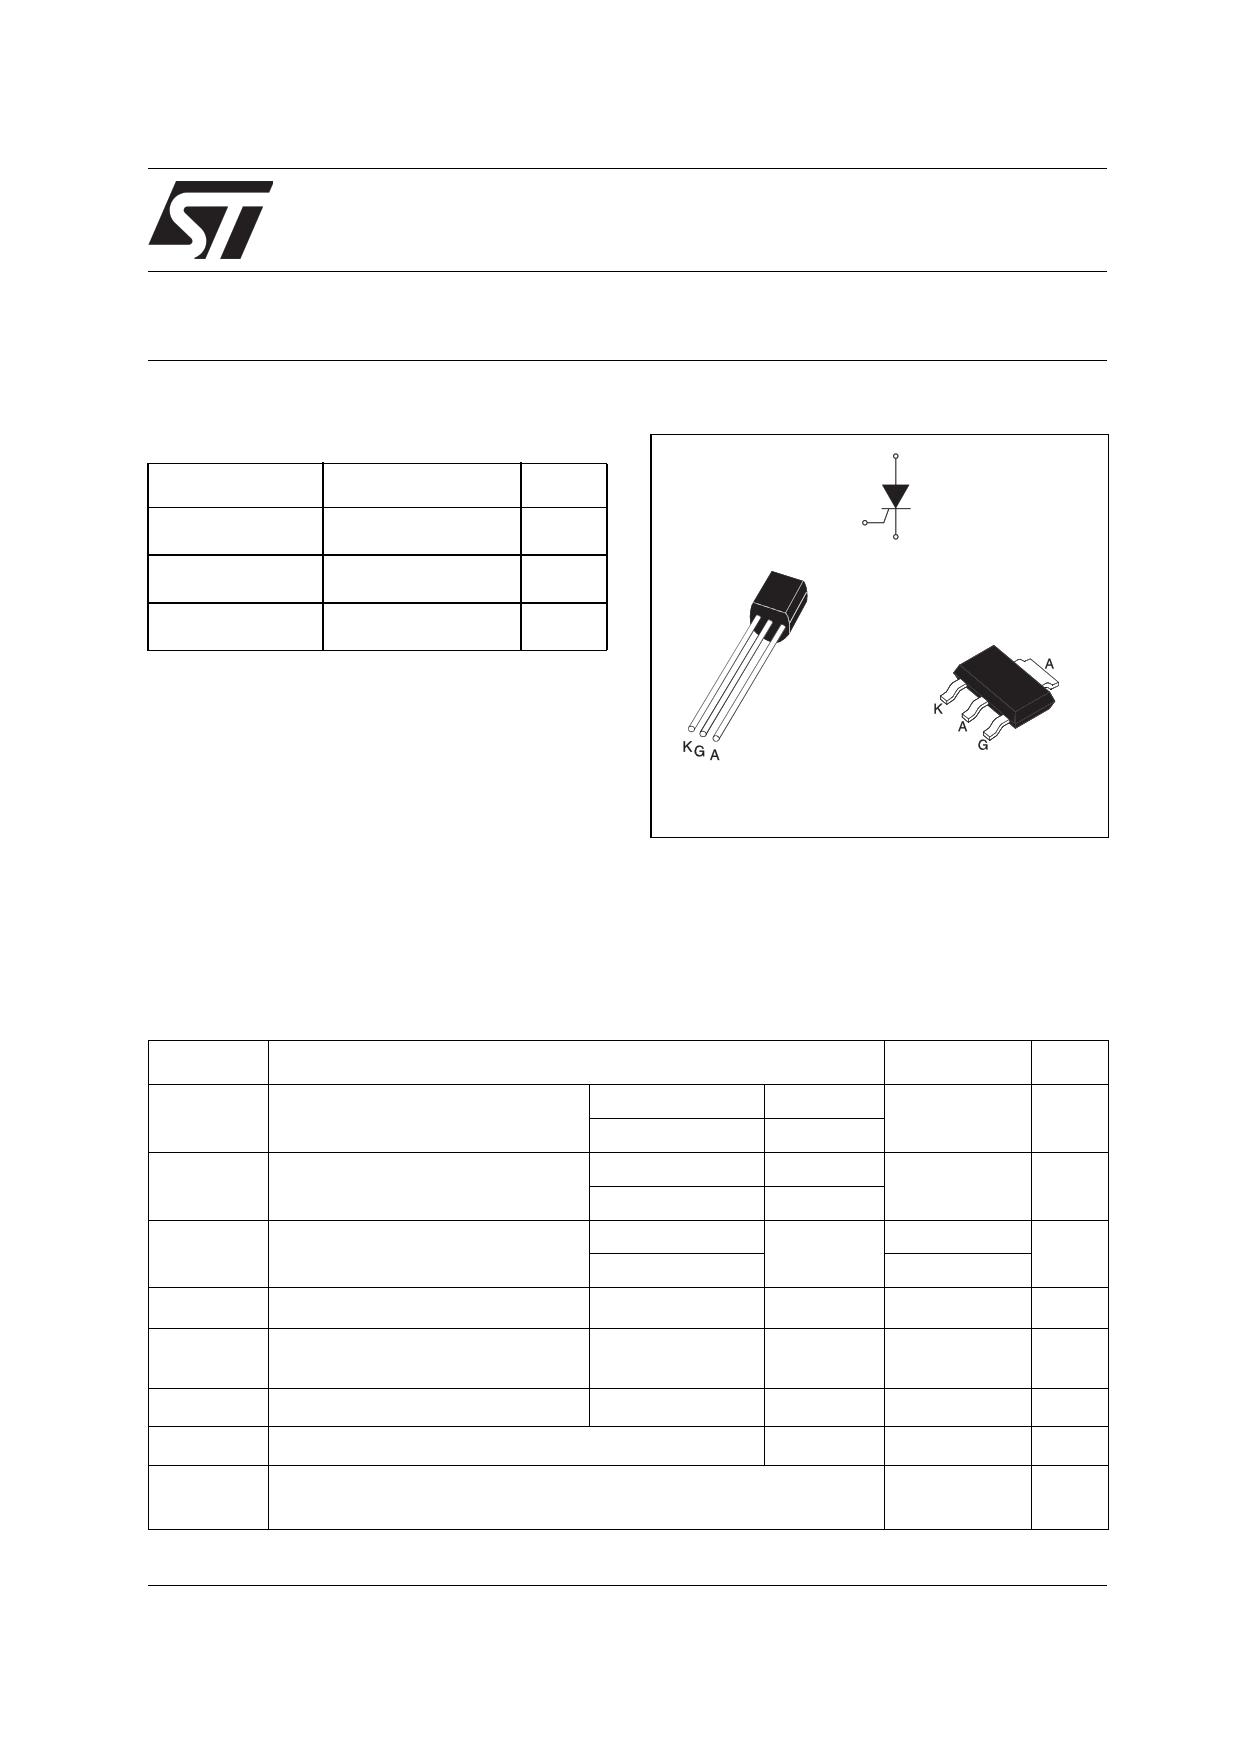 X0202NA2BL2 datasheet